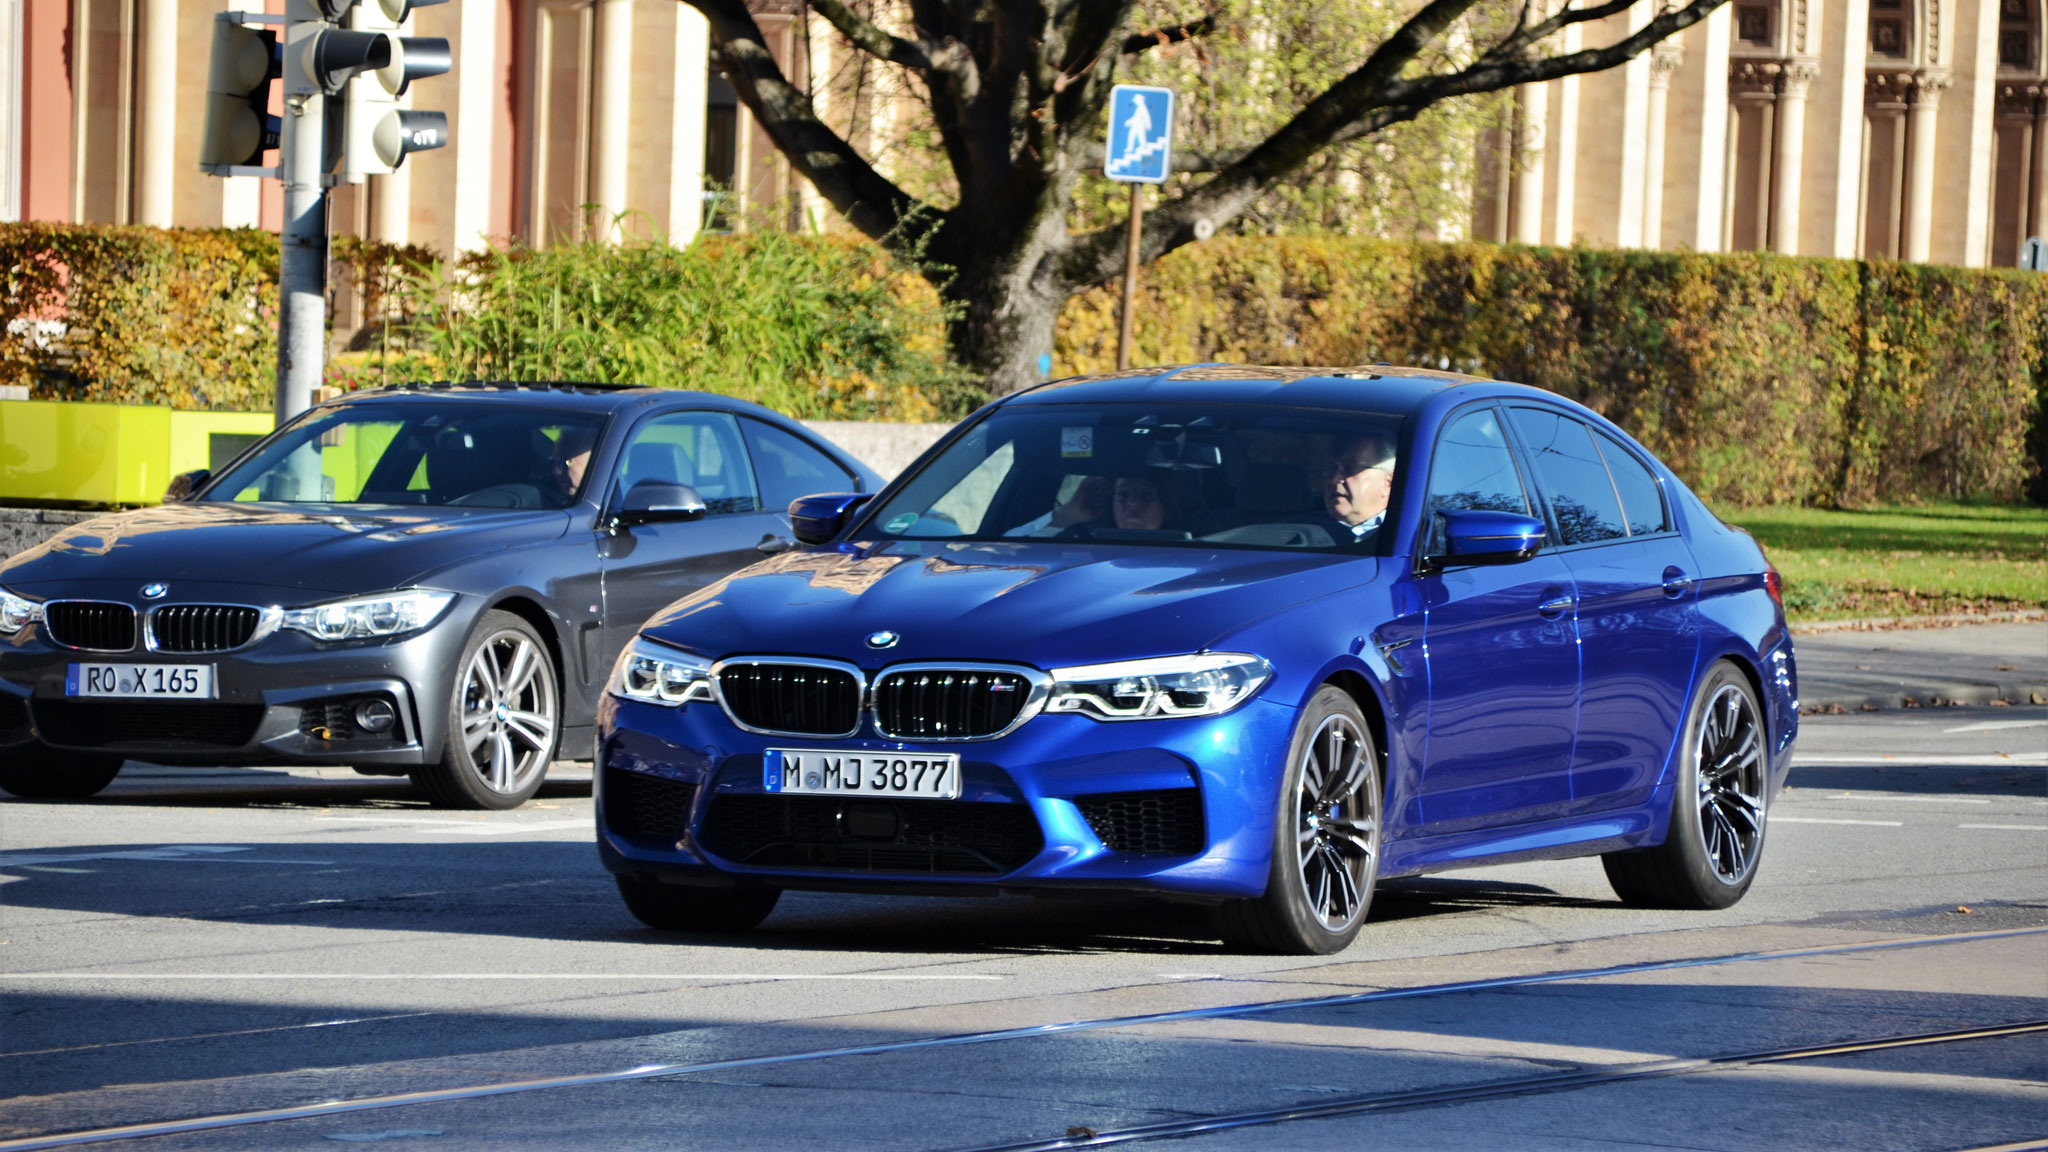 BMW M5 - M-MJ-3877